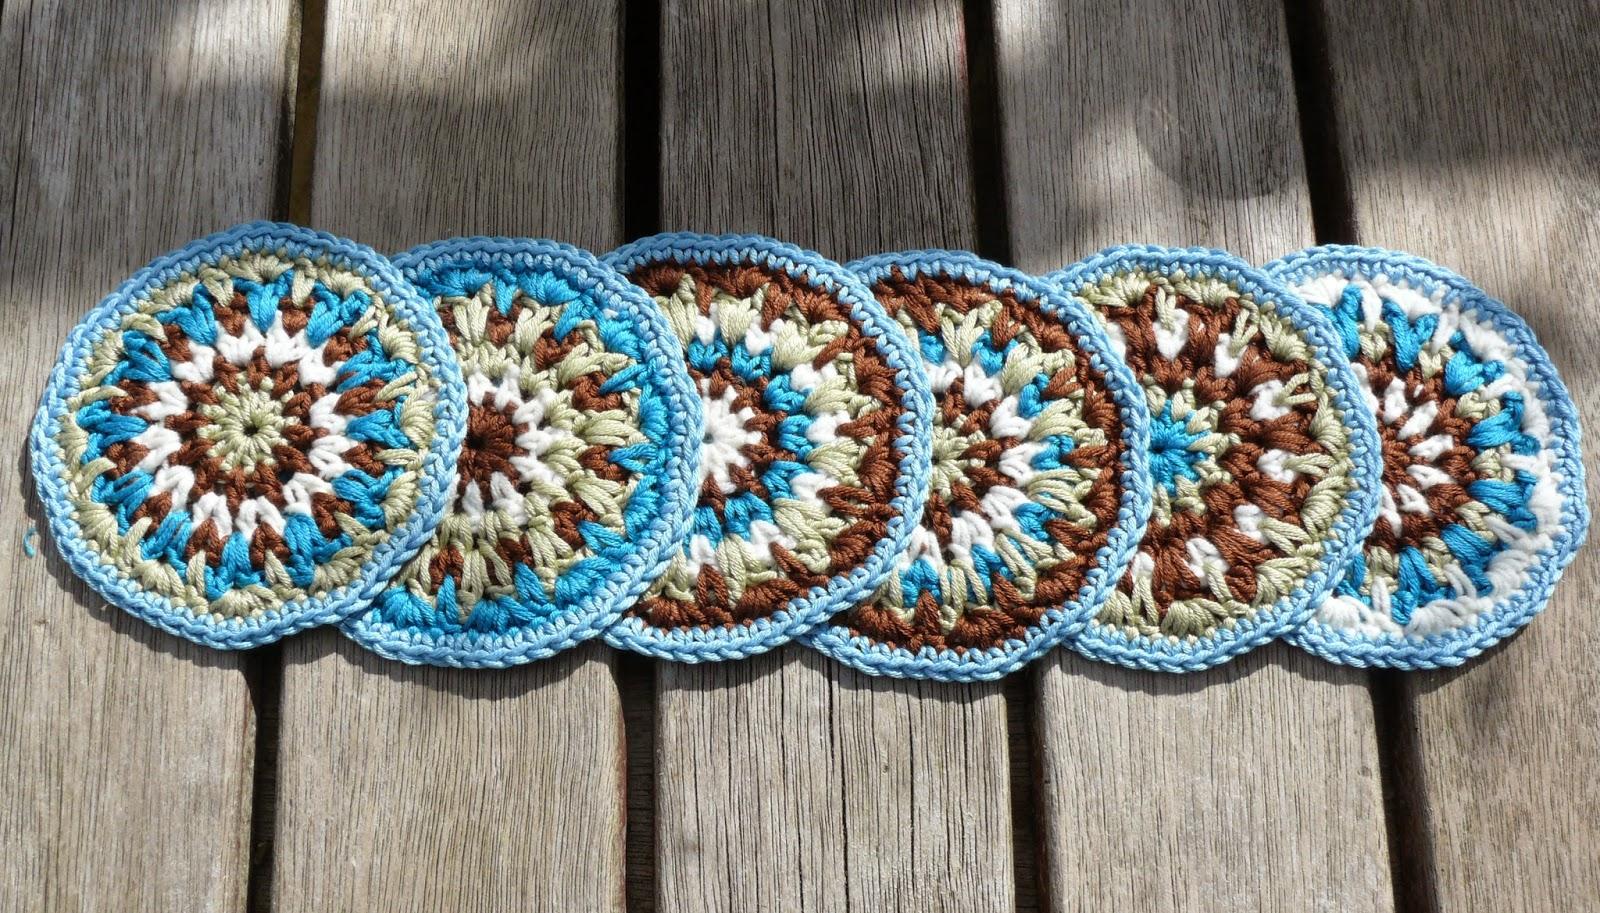 String Theory Crochet: Free Crochet Coaster Pattern.